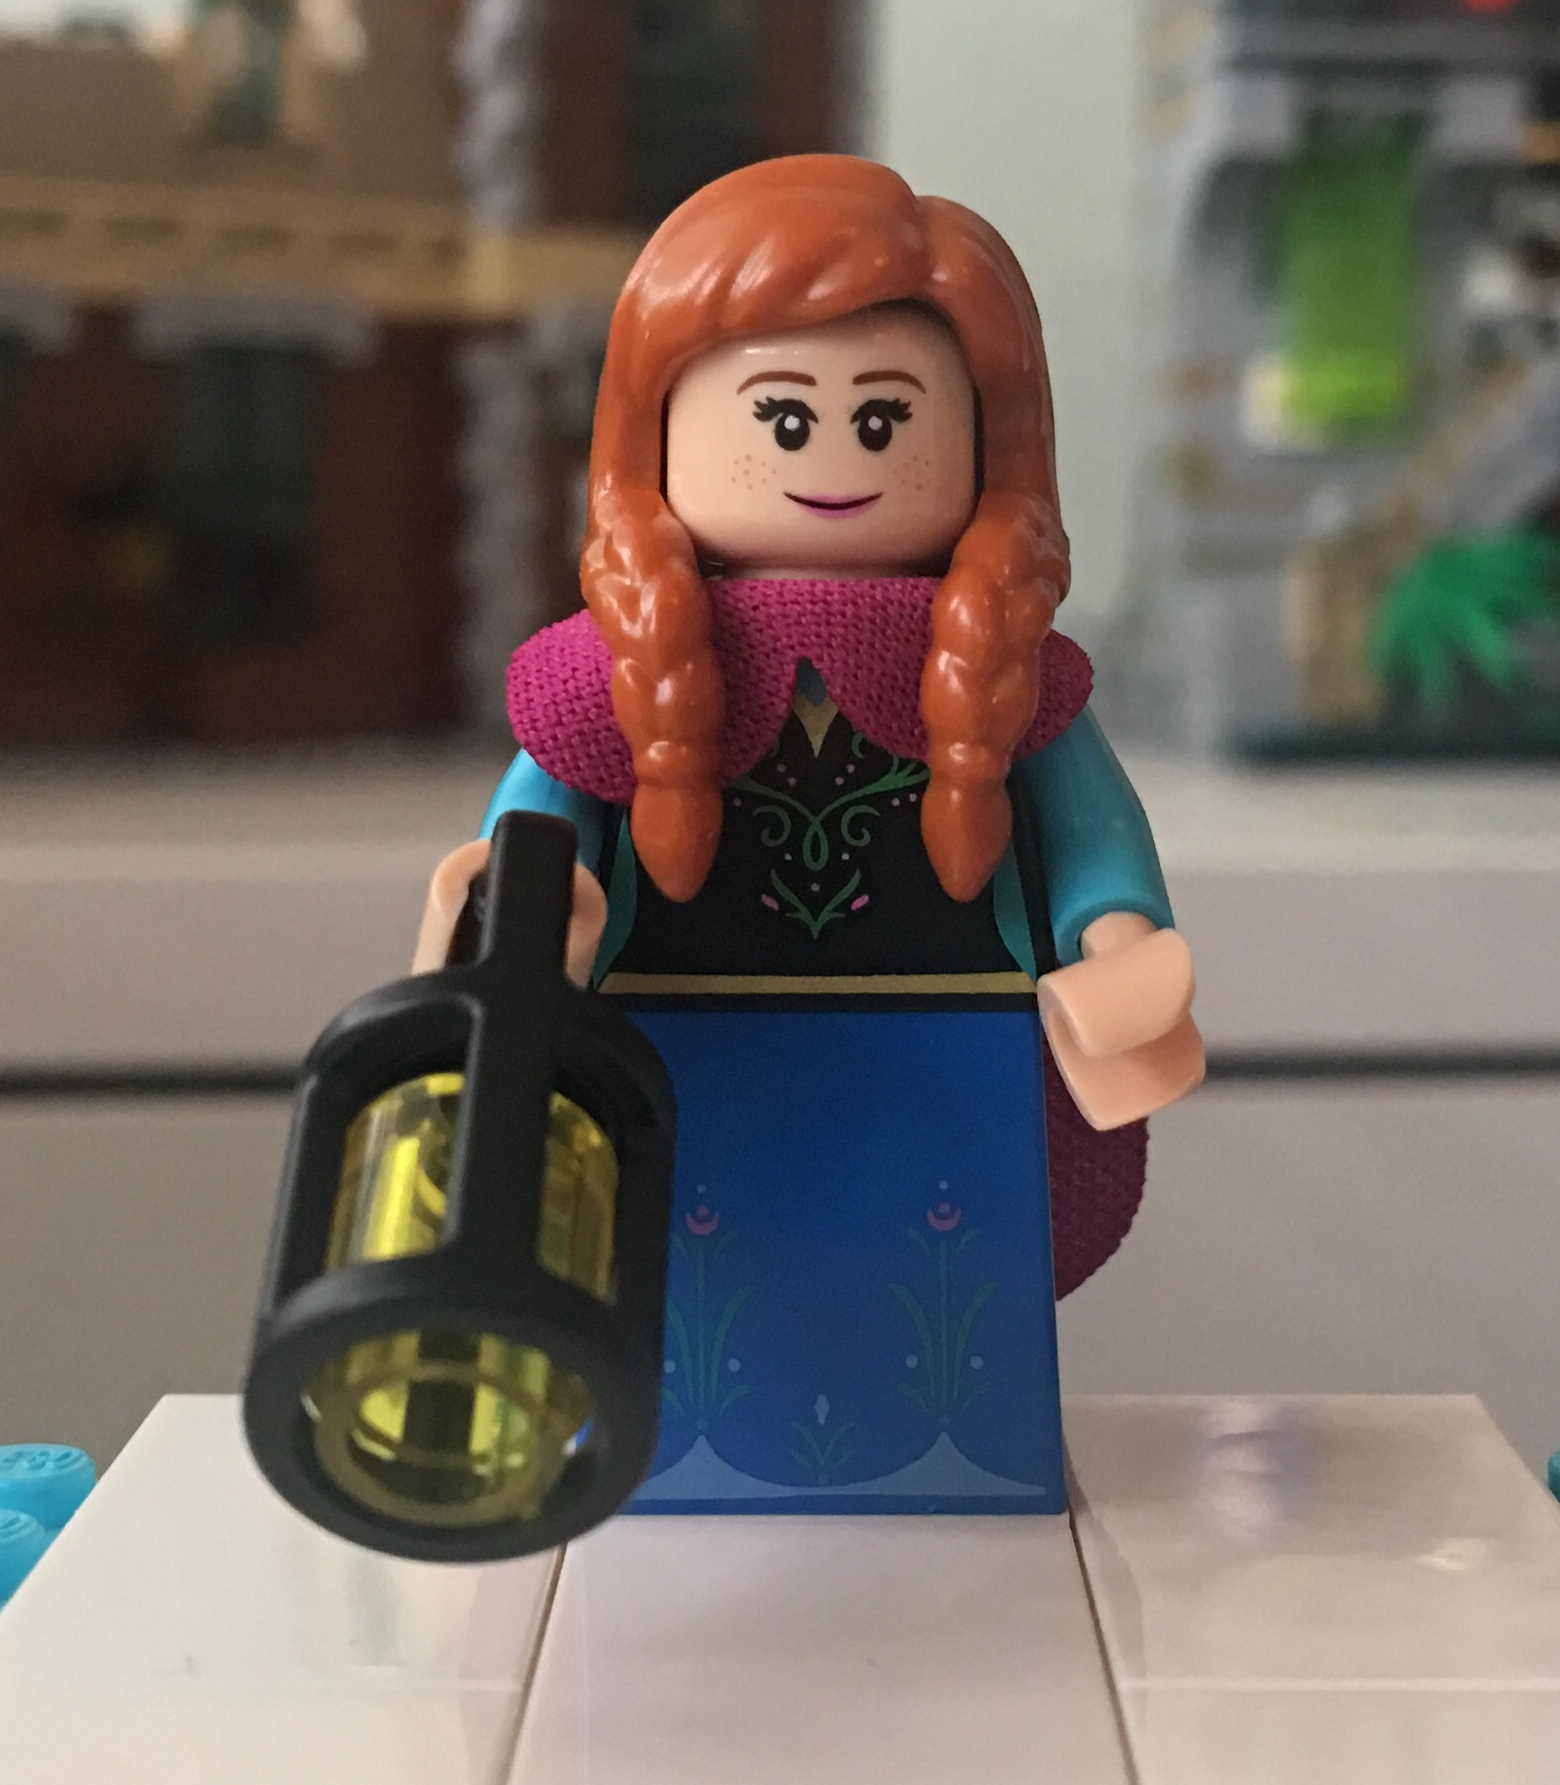 LEGO 4 NEW CASTLE MINIFIGURES PRINCESSES QUEENS FIGURES